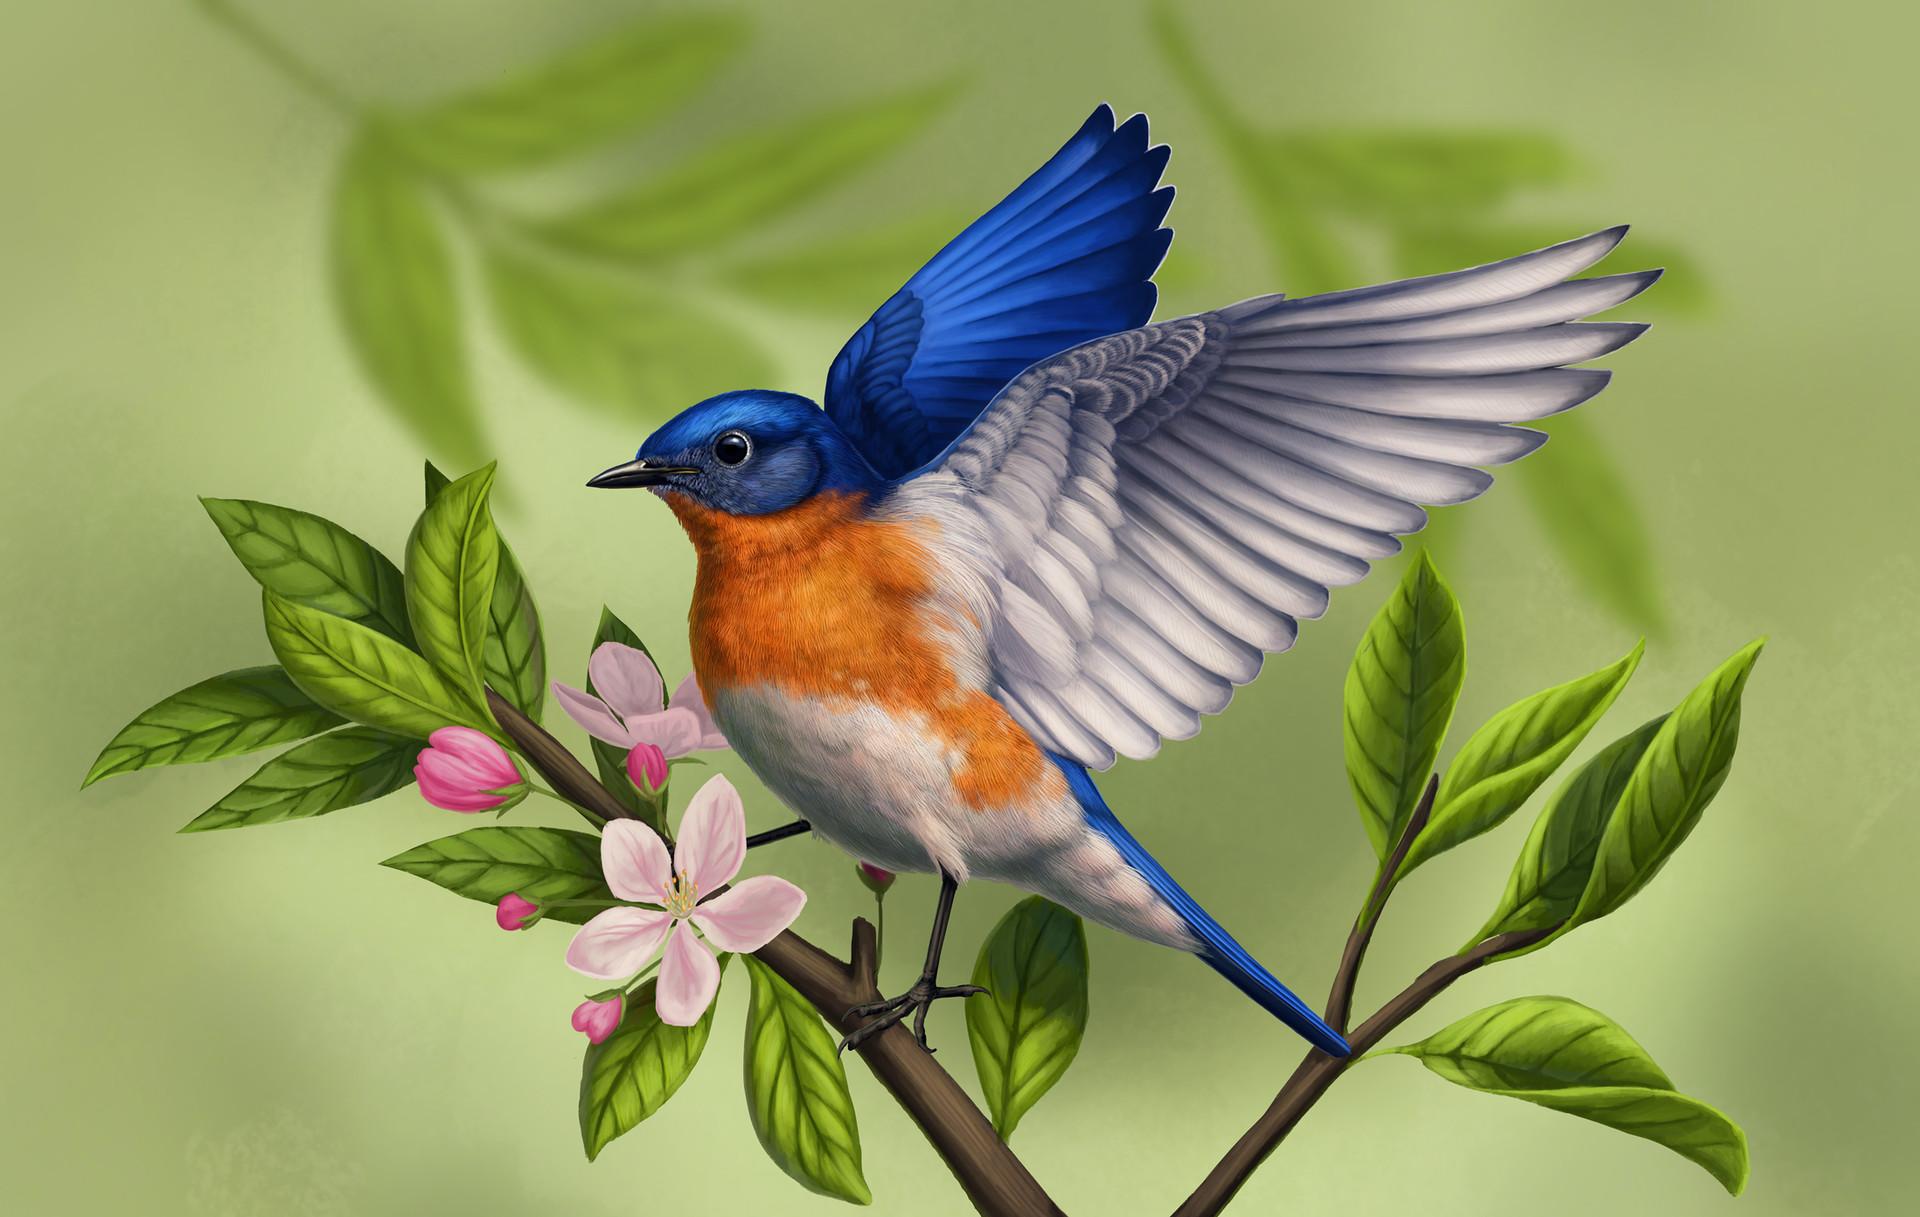 Martina nachazelova eastern bluebird